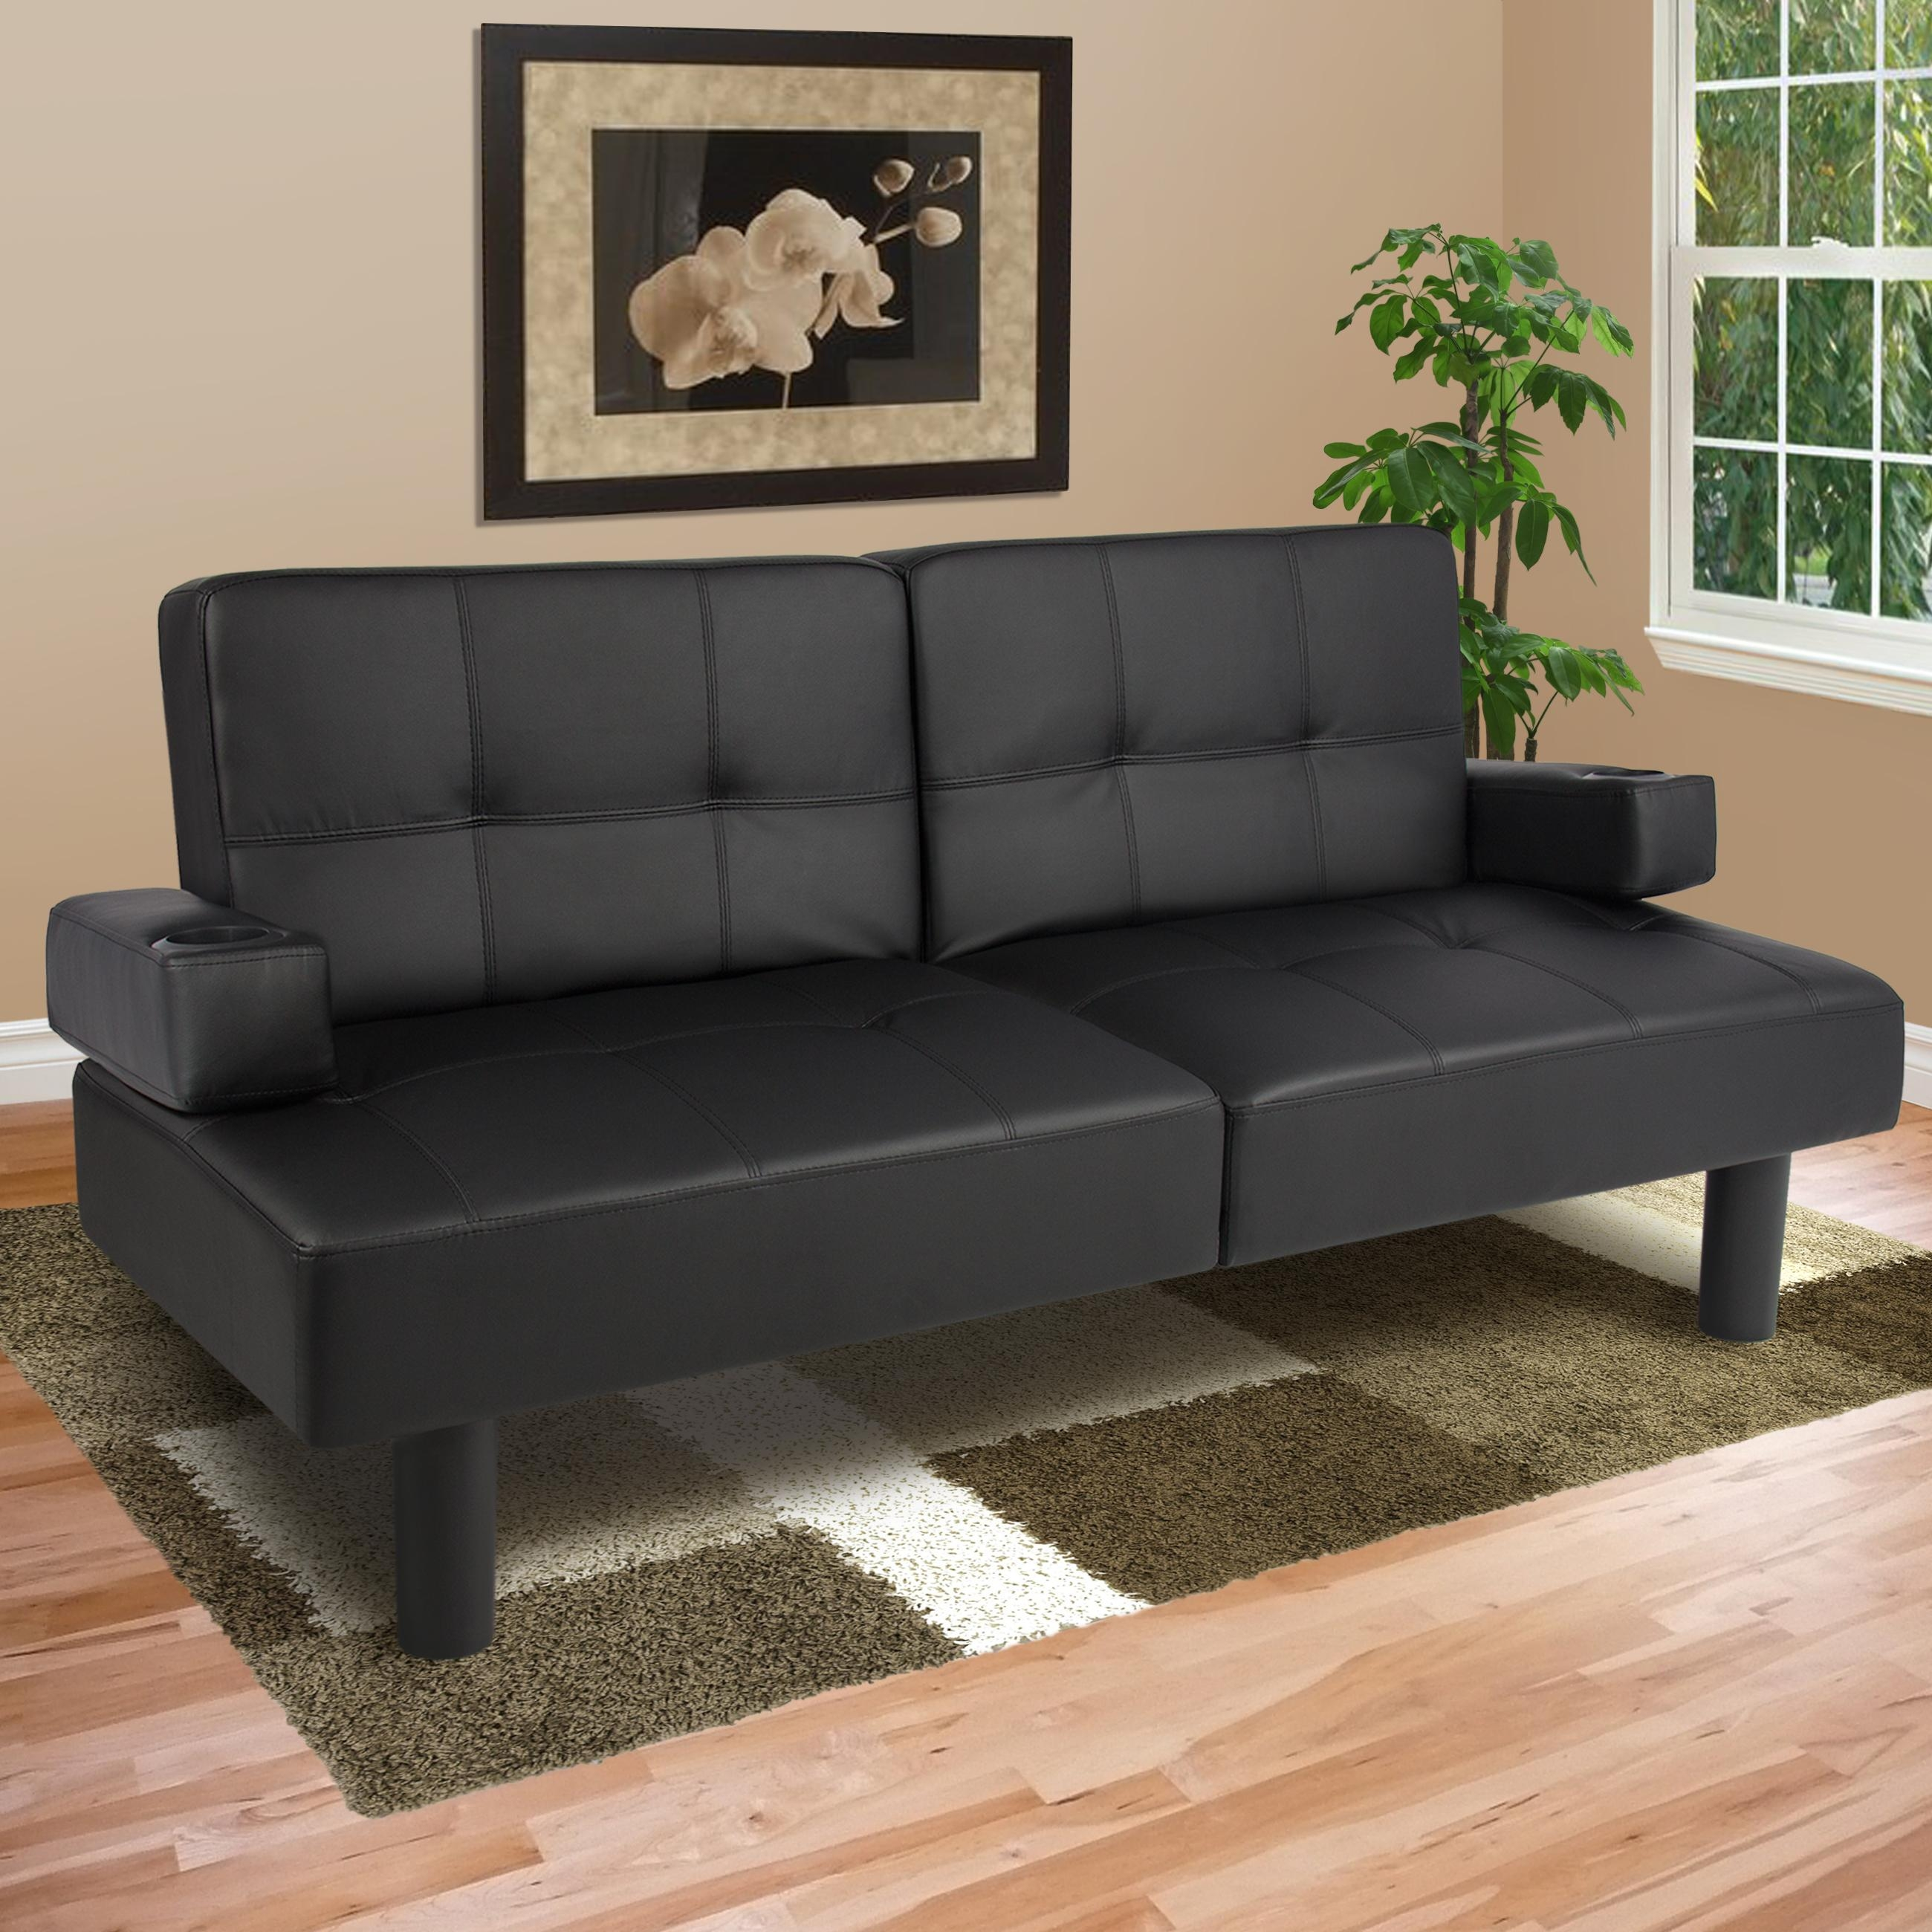 black small sofa pauline thomasville 20 43 choices of futon beds ideas